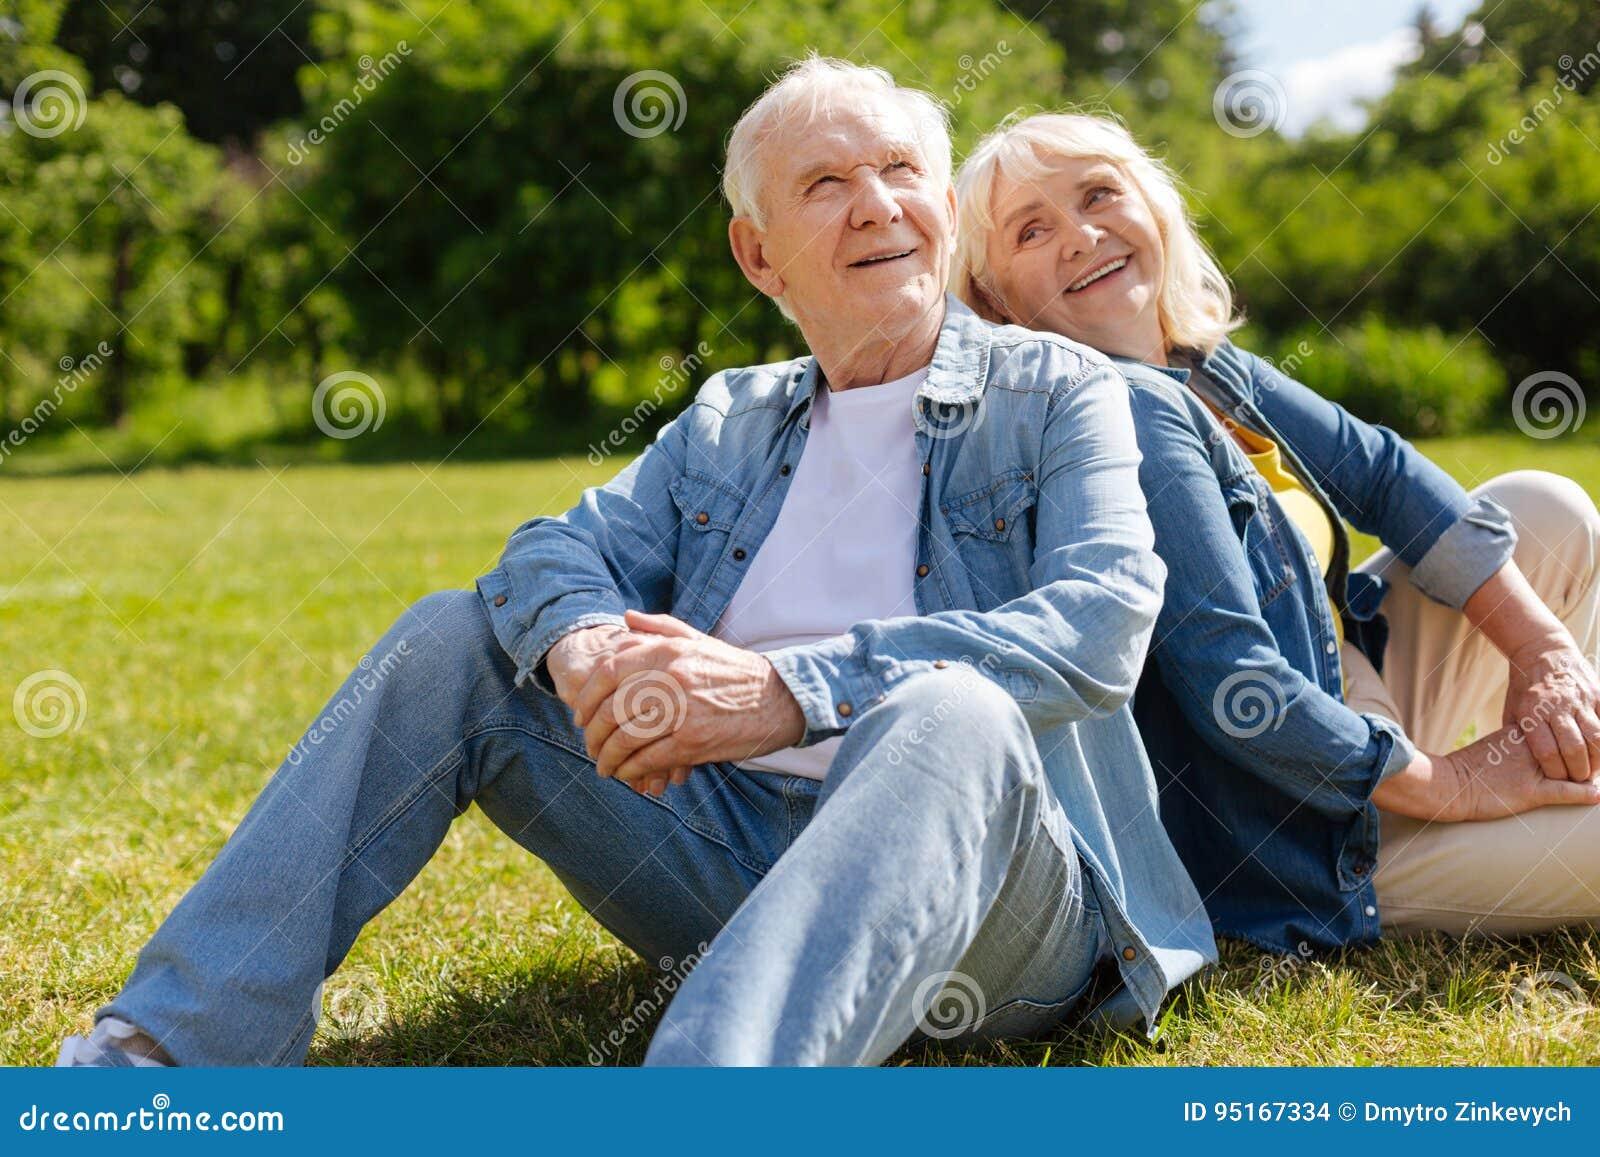 Mature women looking at men